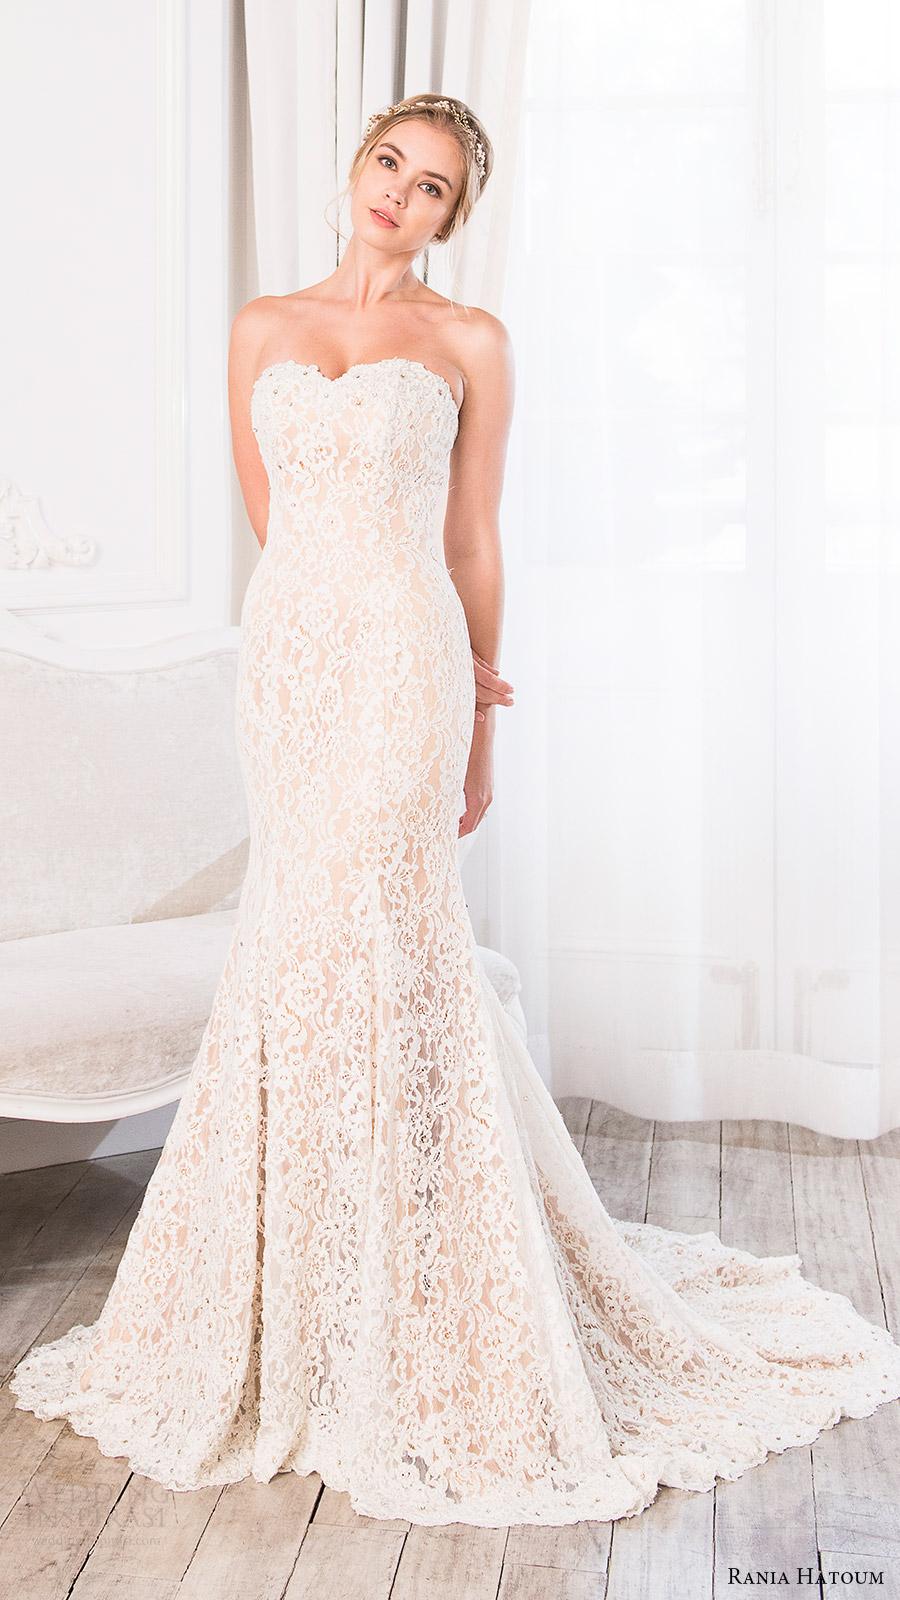 Jewelry For Strapless Wedding Dress 68 Fancy rania hatoum bridal spring